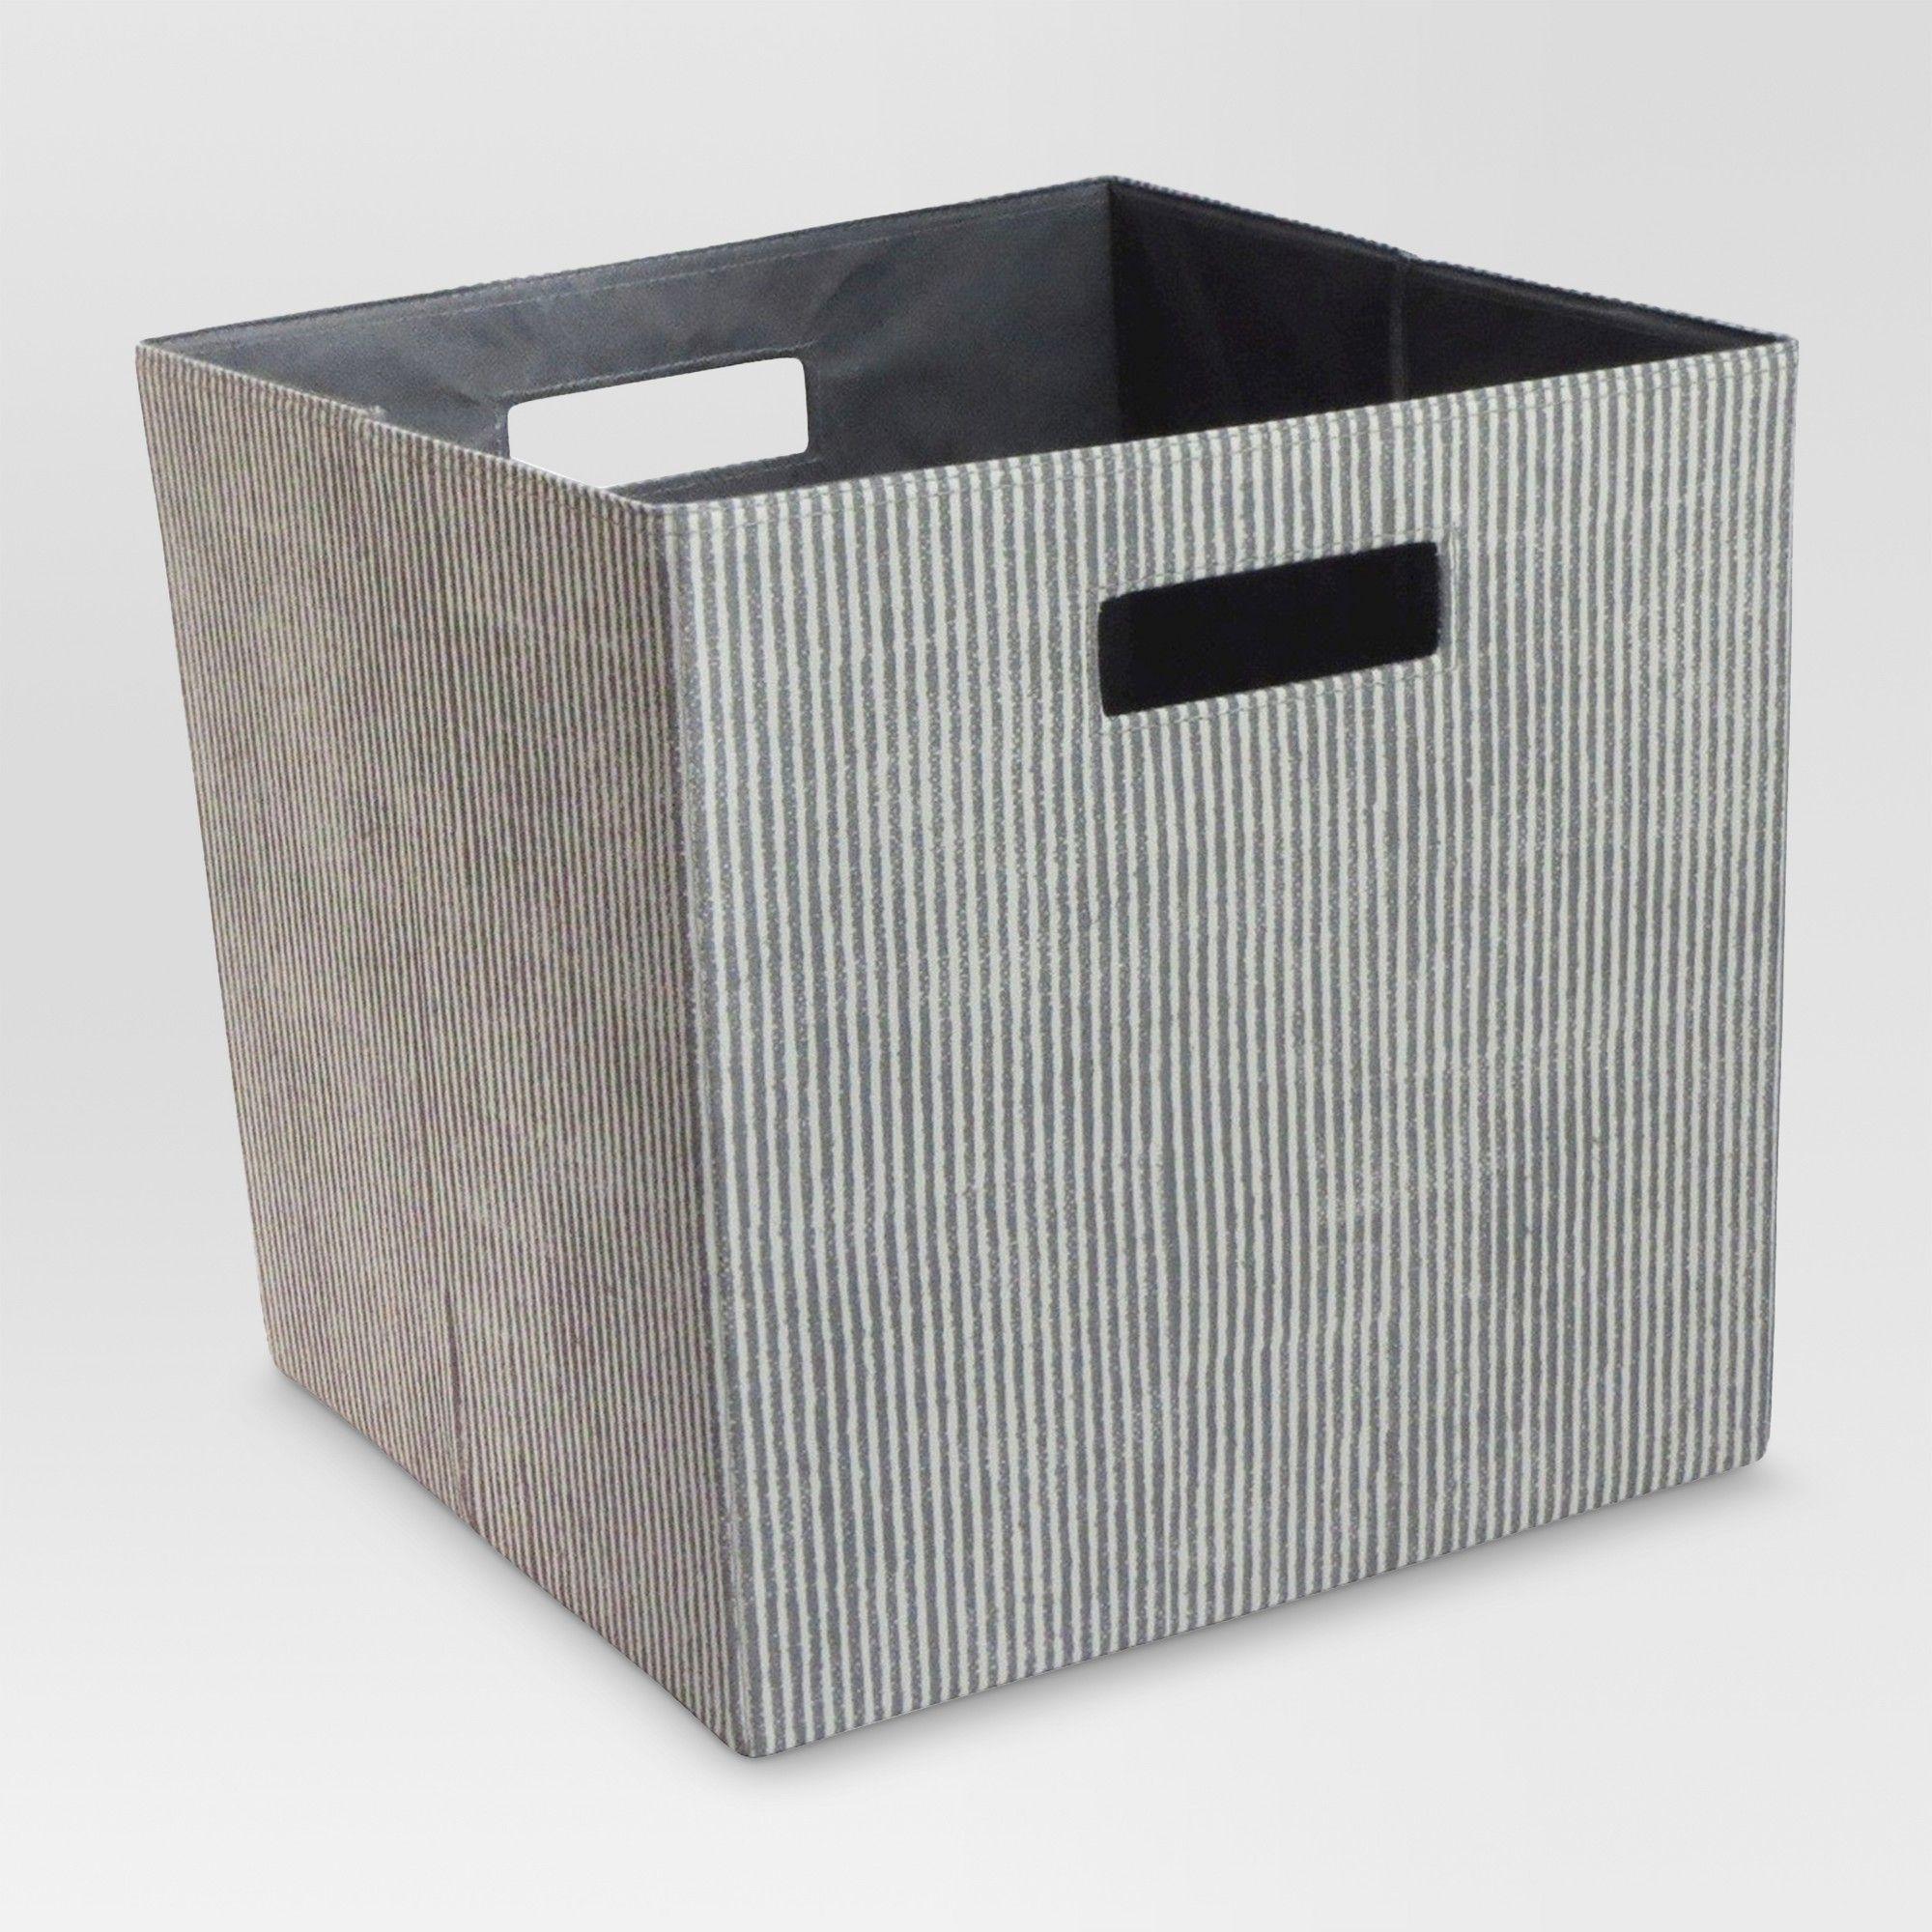 13 Fabric Cube Storage Bin Striped Gray Threshold Cube Storage Bins Cube Storage Storage Bin